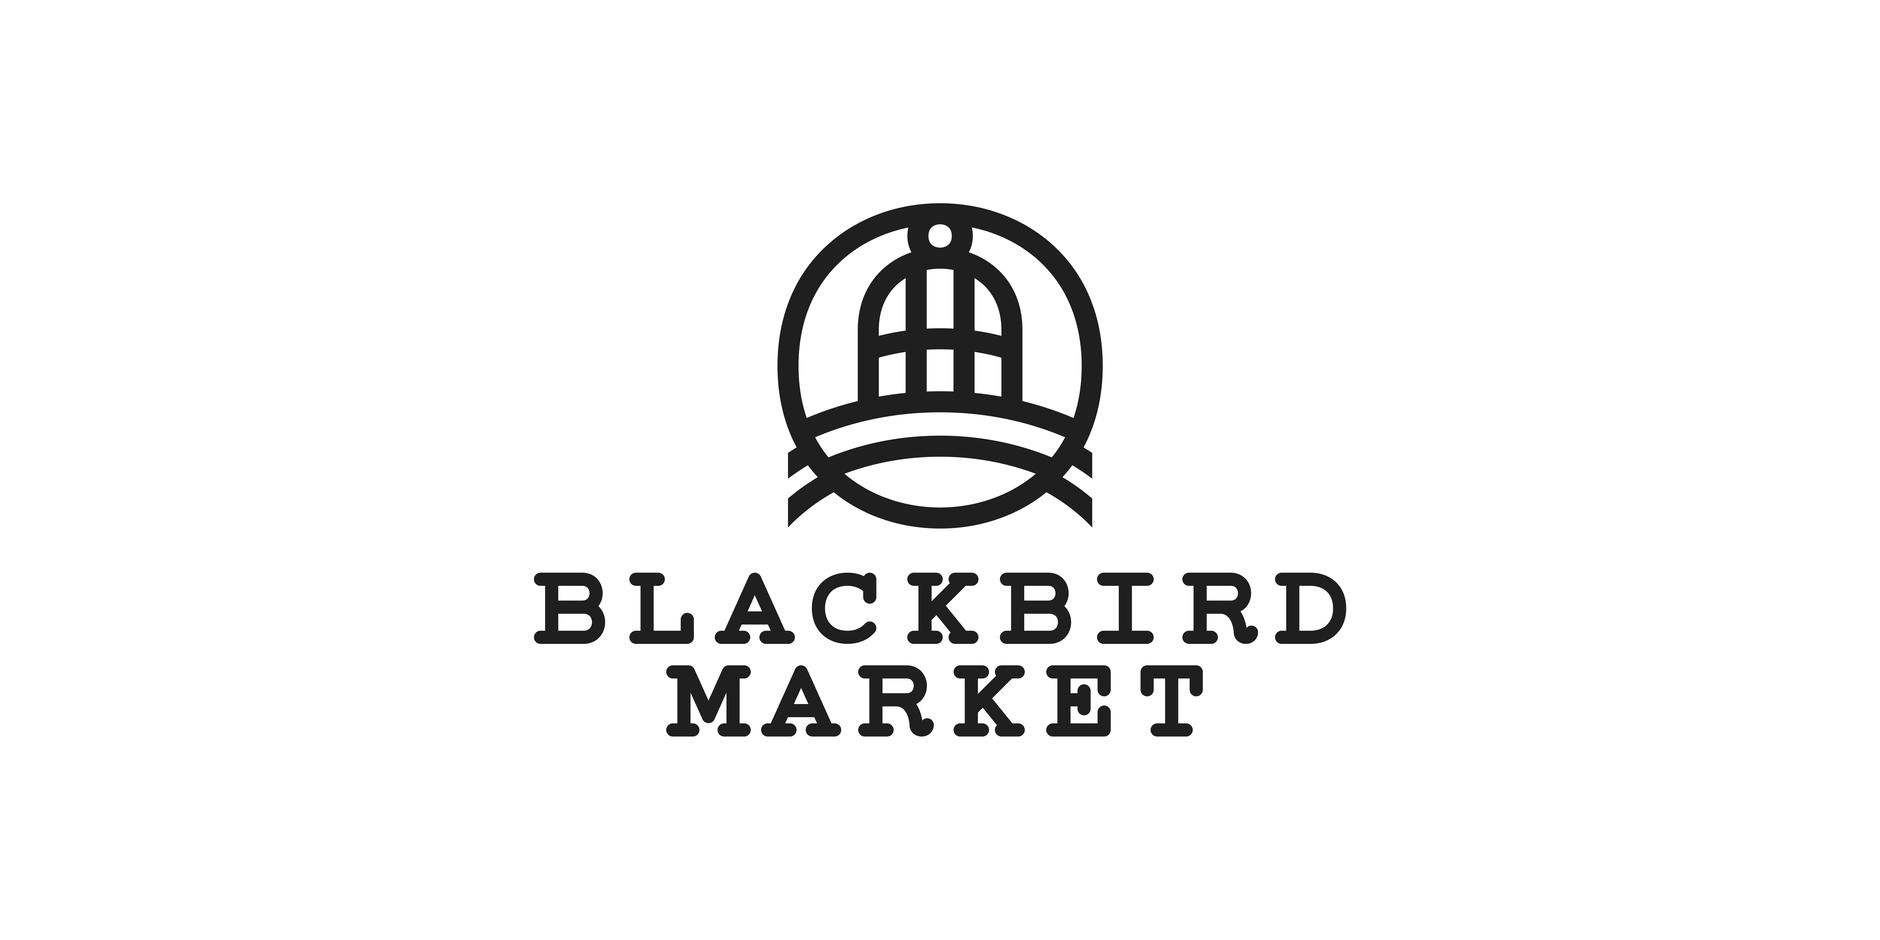 Blackbird Market